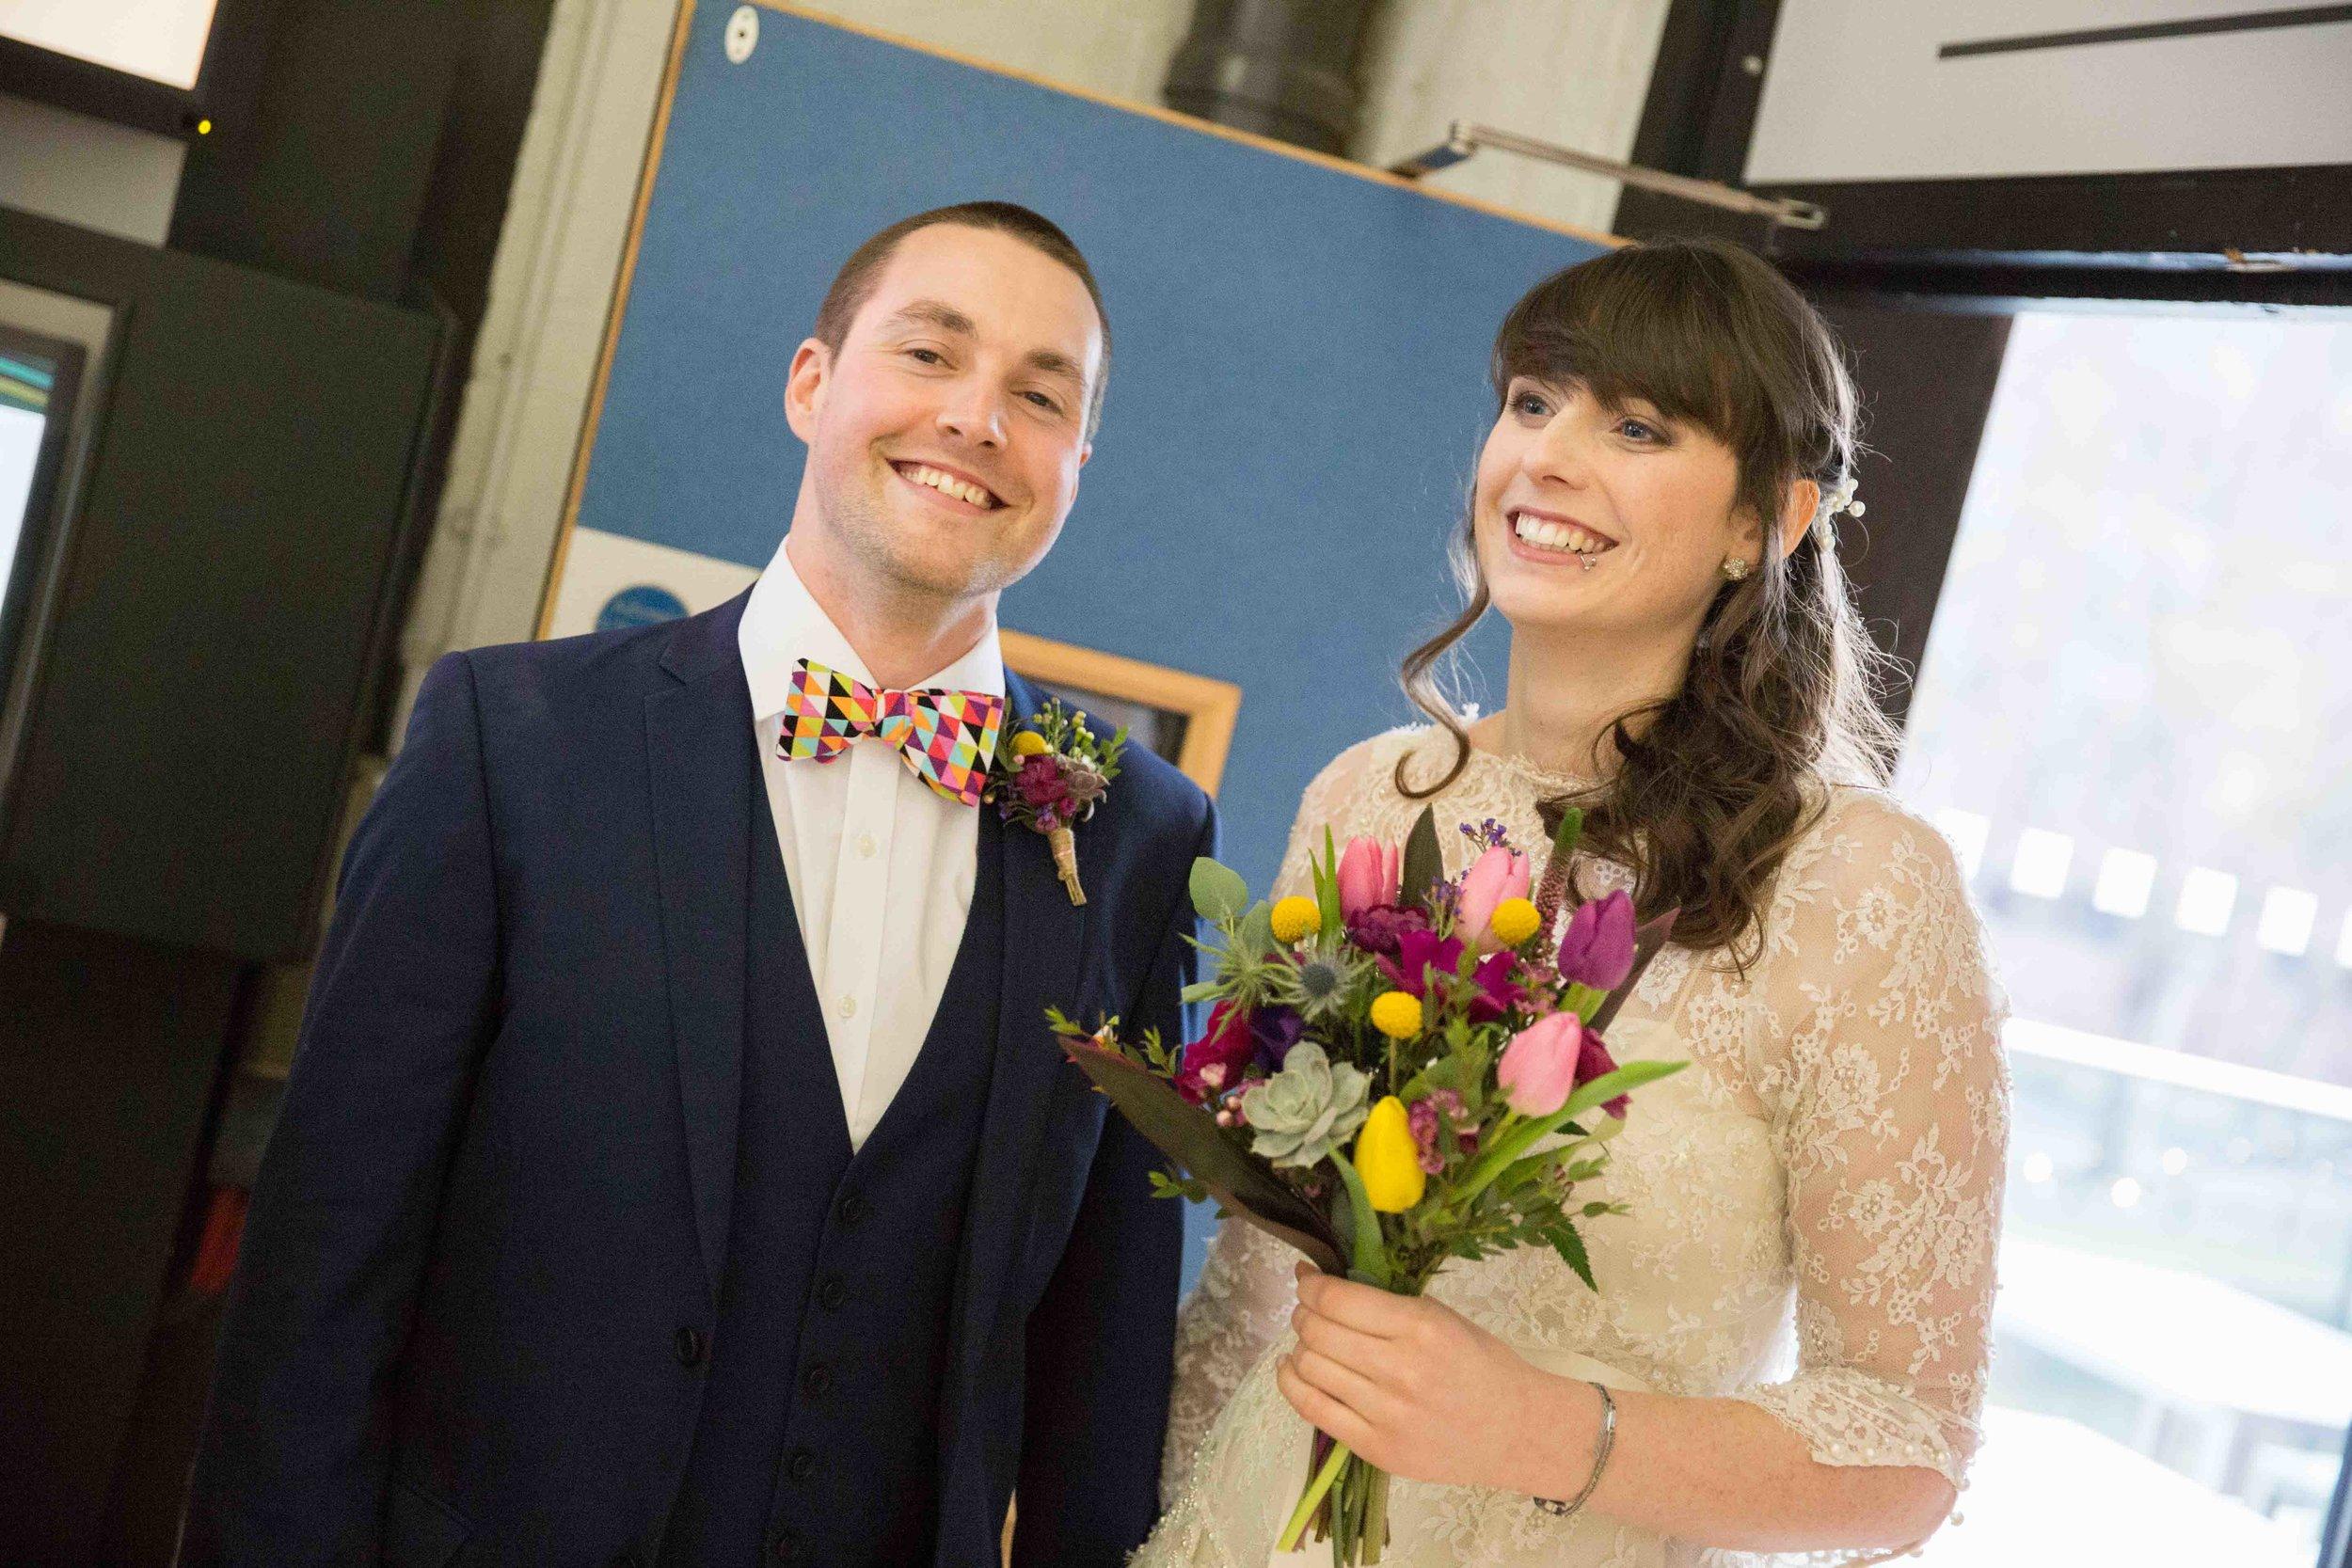 Adam & Faye - Wright Wedding Photography - Bristol Wedding Photographer -58-2.jpg